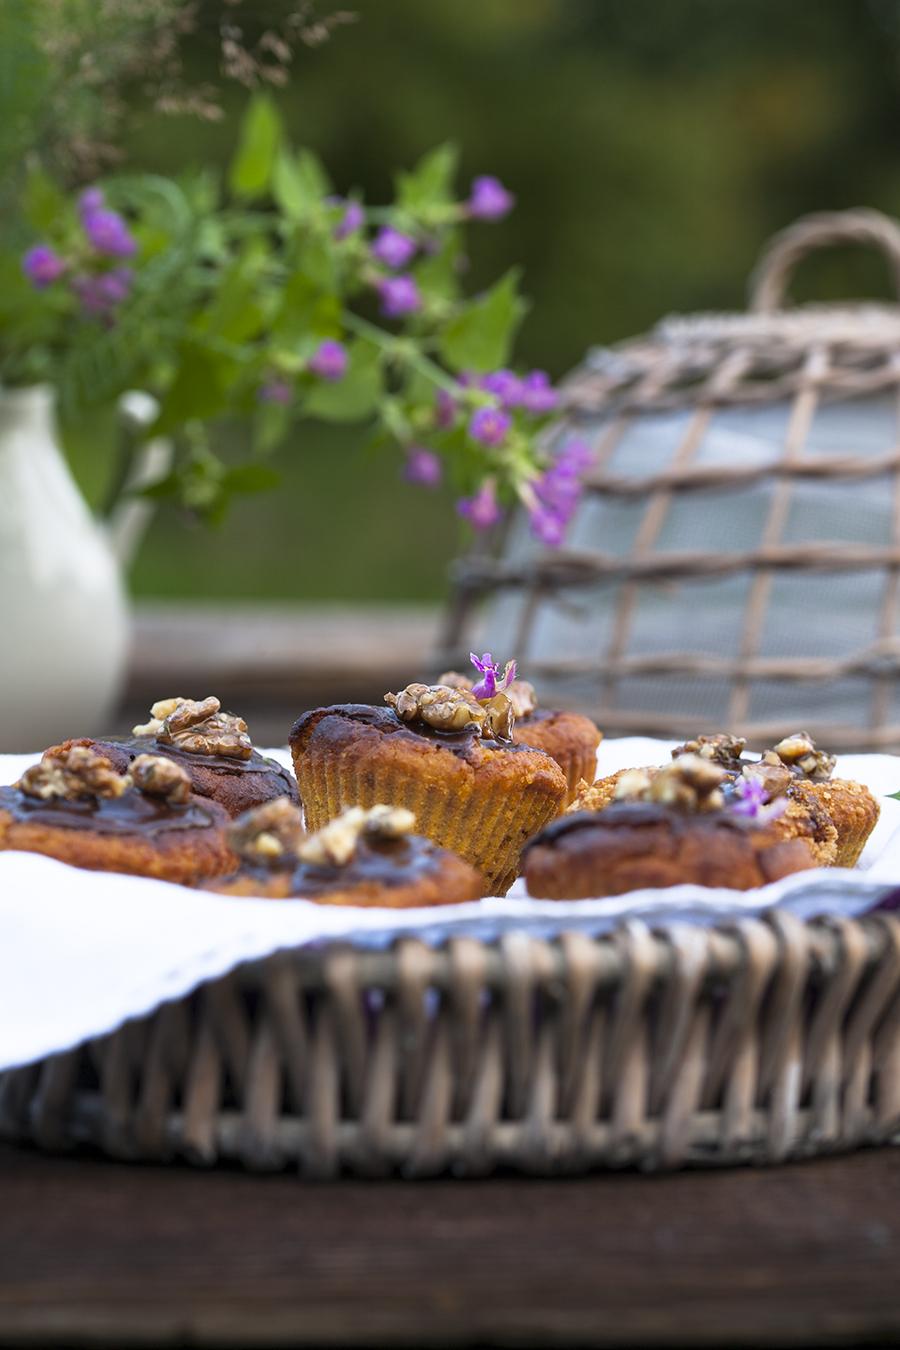 bezglutenowe muffiny dyniowe, muffiny dyniowe, muffiny bezglutenowe, muffiny zdyni